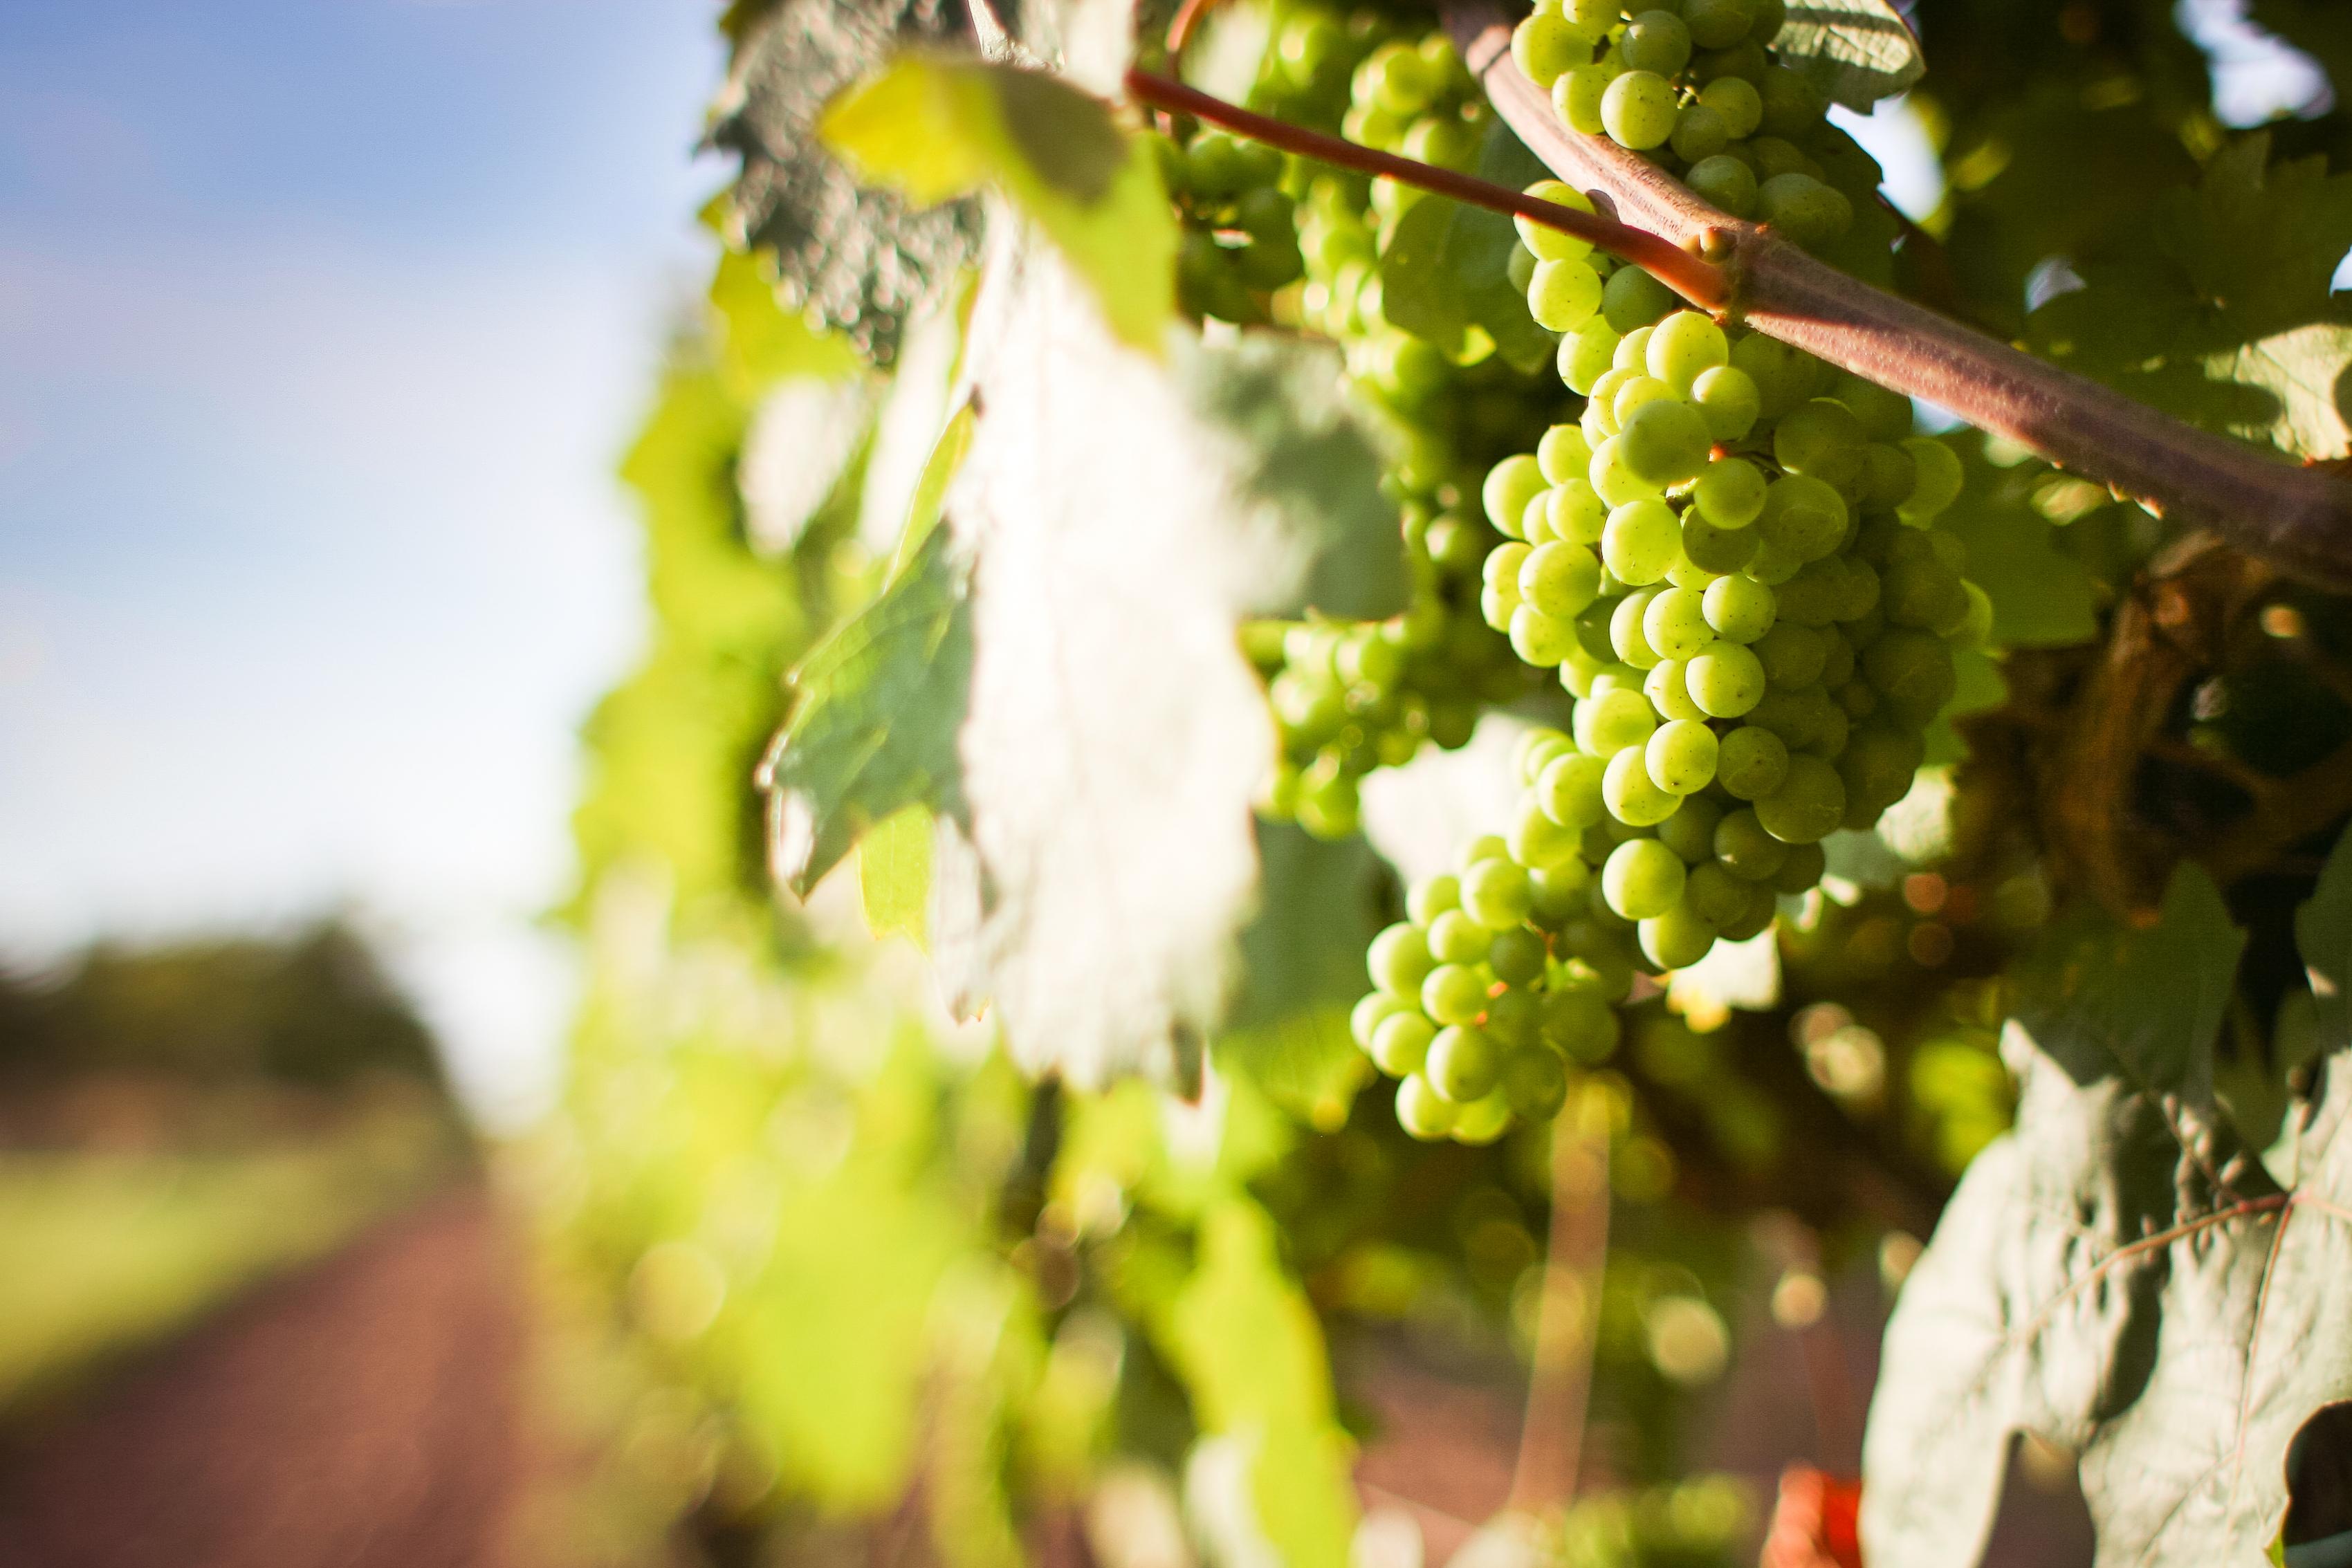 grapevine-with-detail-of-grapes-picjumbo-com.jpg